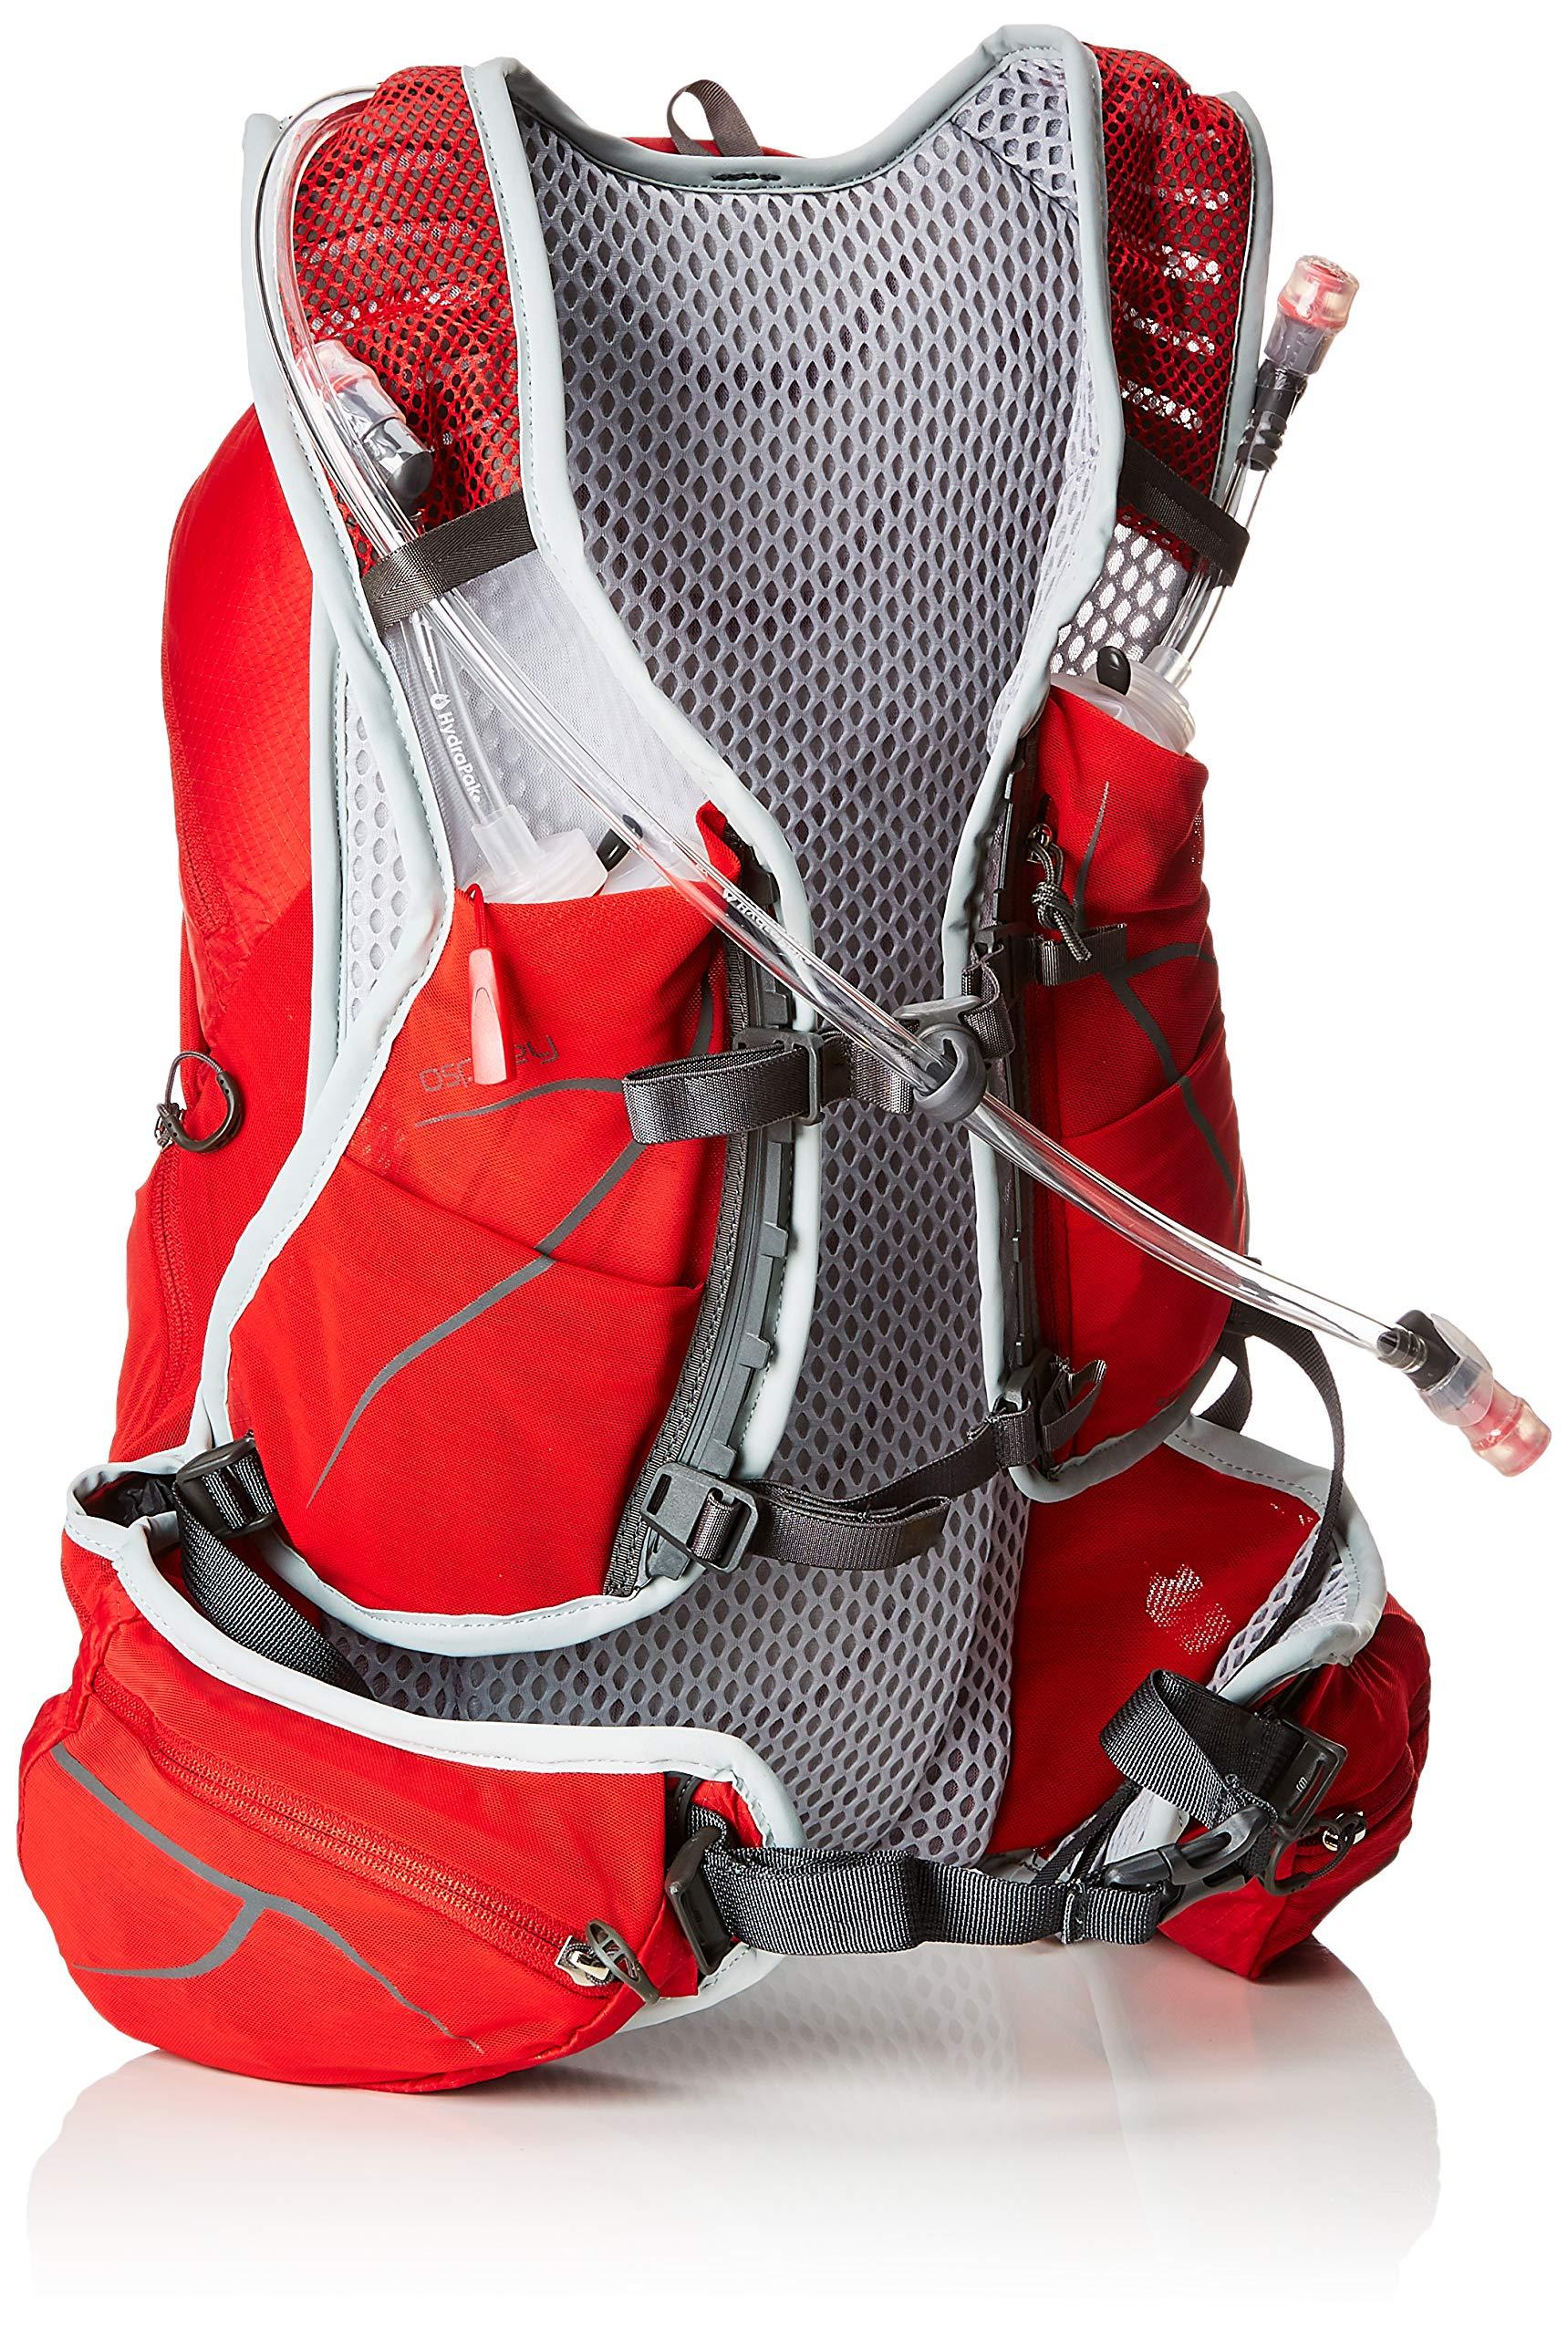 91sUWCztjML - Osprey Duro Running Hydration Pack with 2.5L Hydraulics LT Reservoir